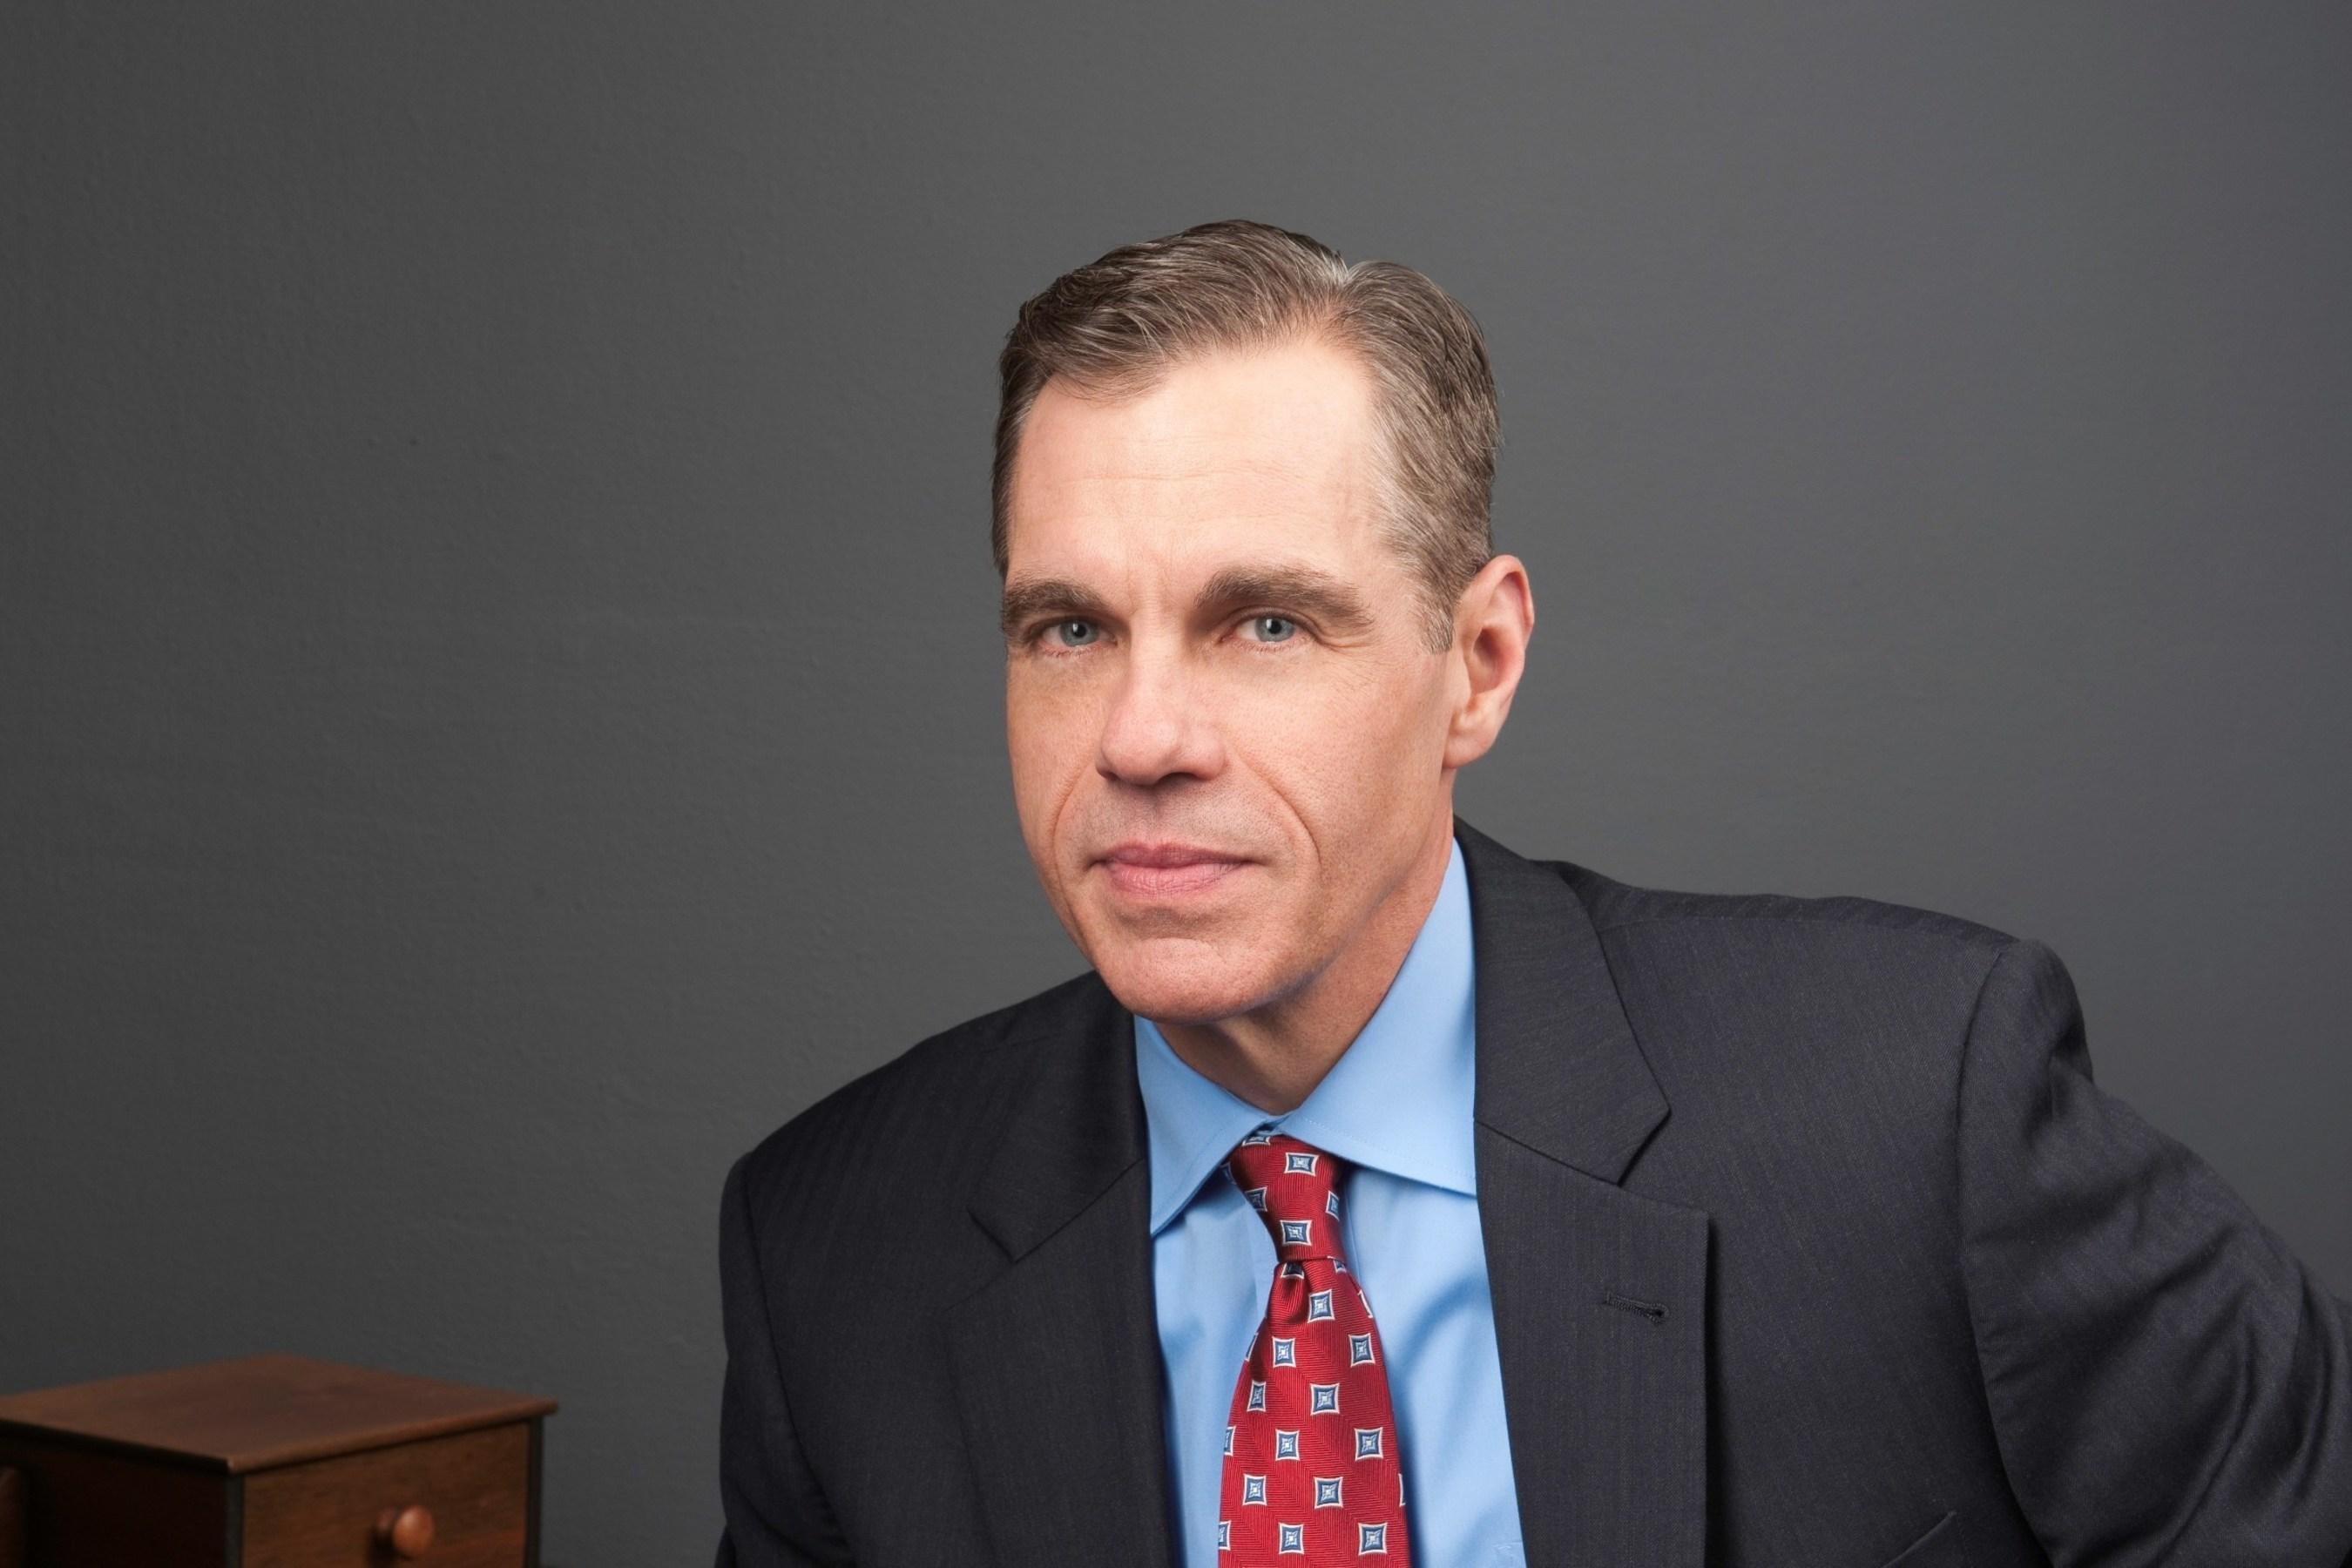 Bob Evans, Freudenberg North America president and regional representative